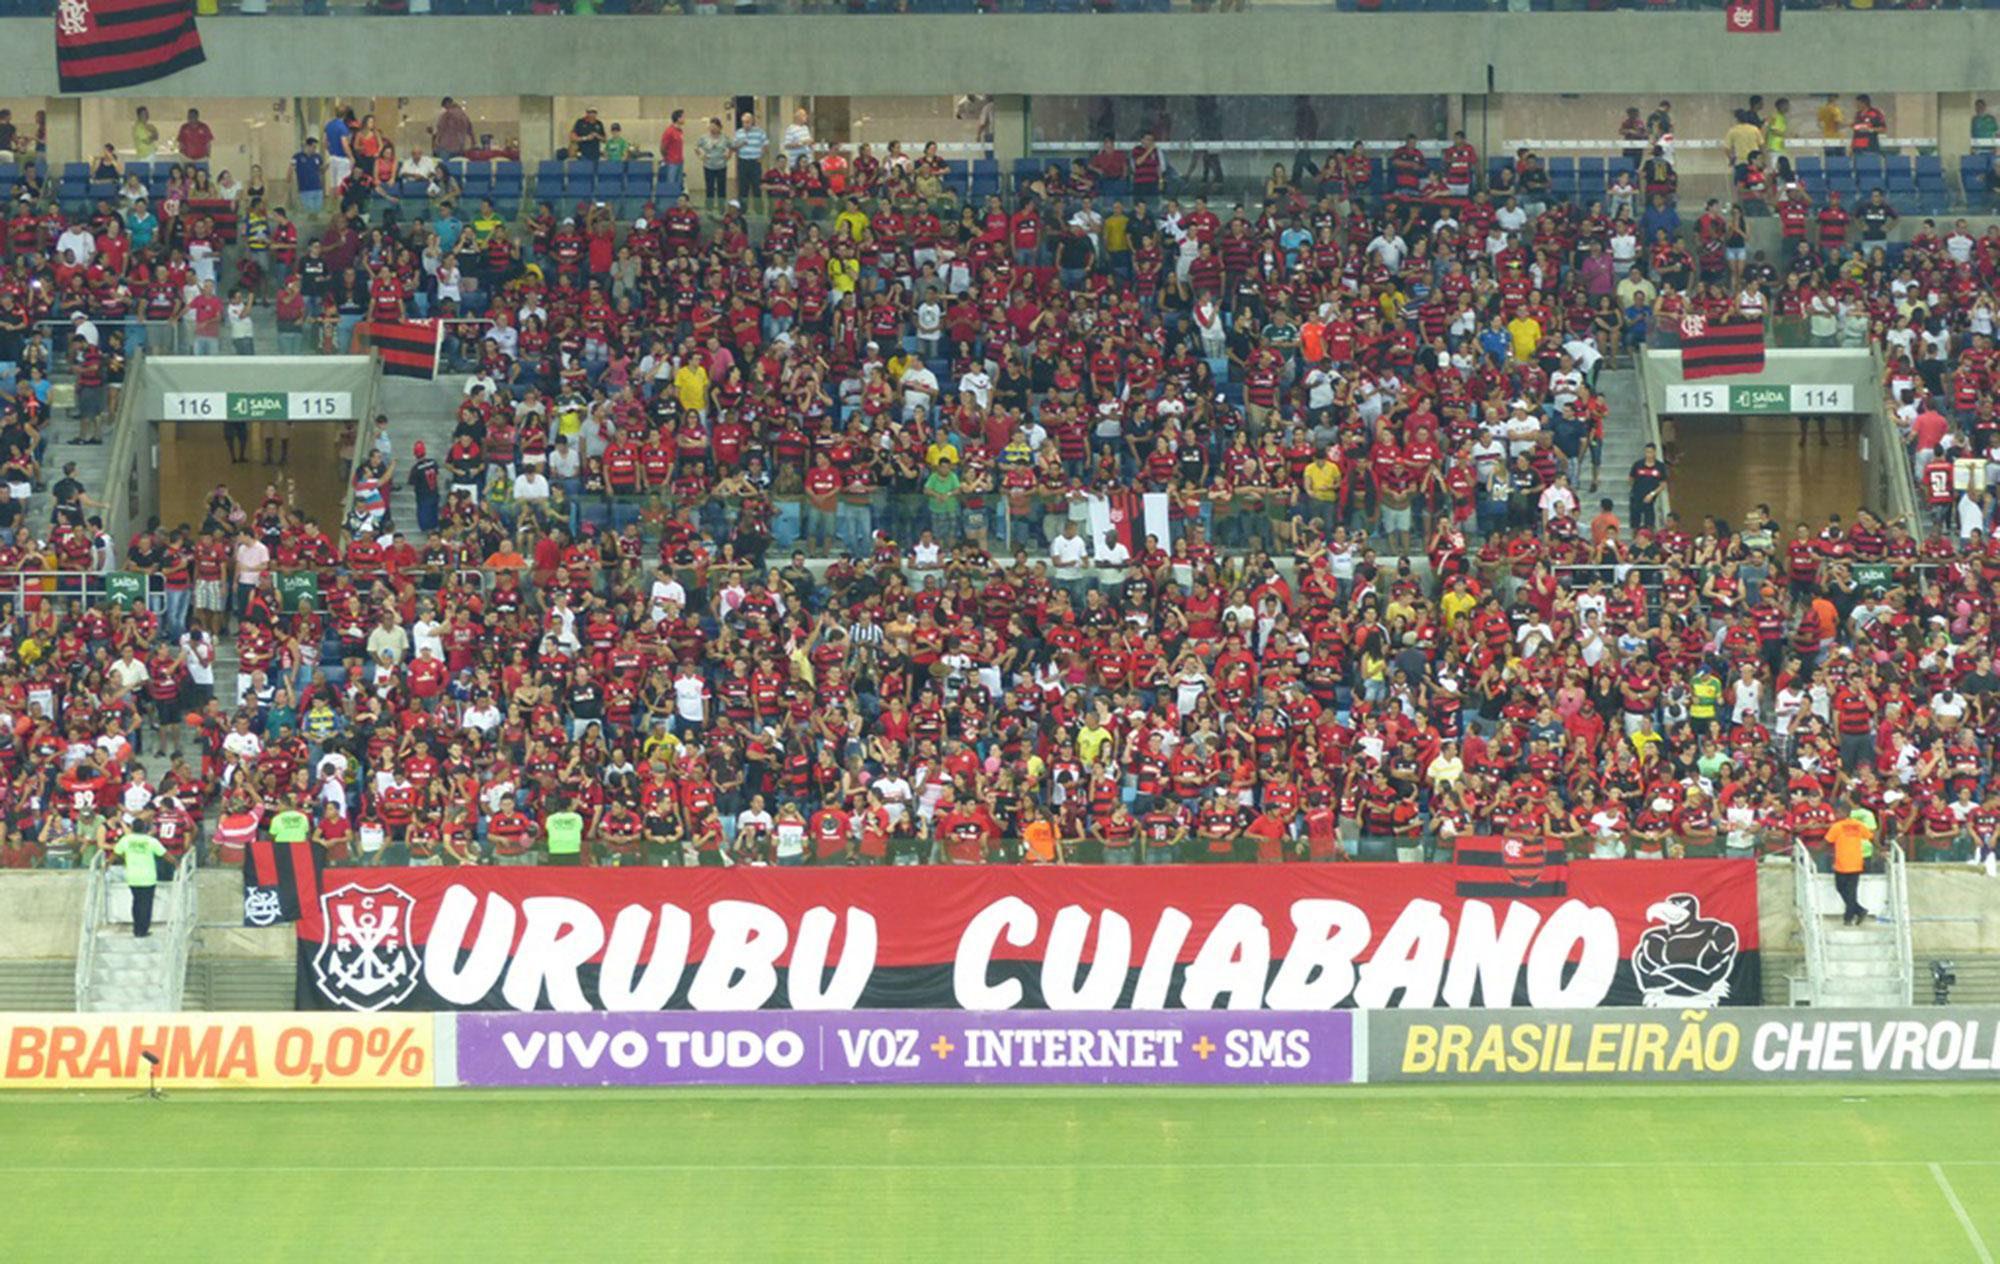 Vasco x Flamengo na Arena Pantanal  ingressos à venda a partir de R  70 c8b42cec6dfe3